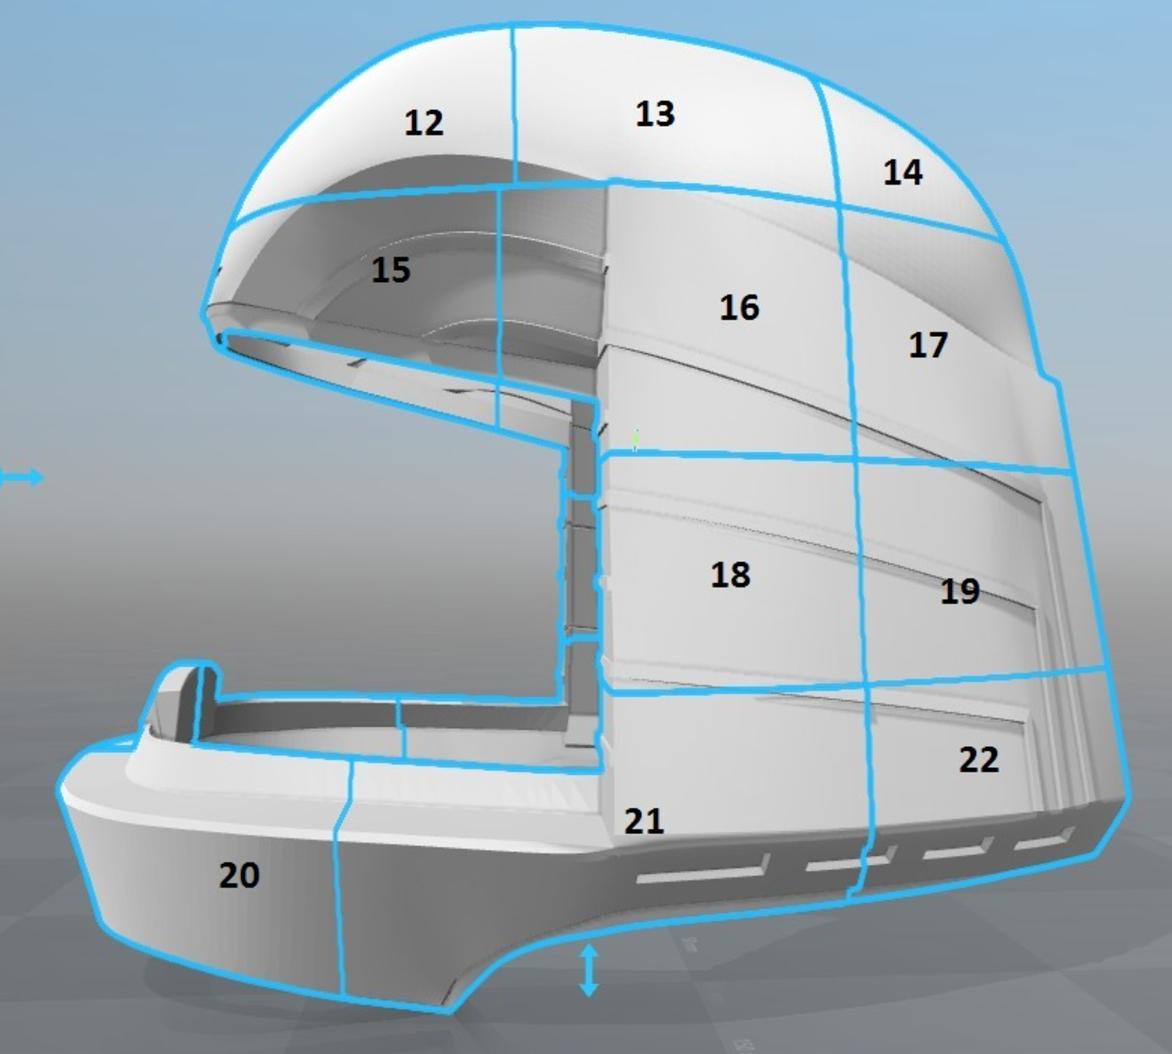 Capture d'écran 2017-09-15 à 16.16.33.png Download free STL file Battlestar Galactica Colonial Viper Pilot Helmet • 3D printing object, VillainousPropShop